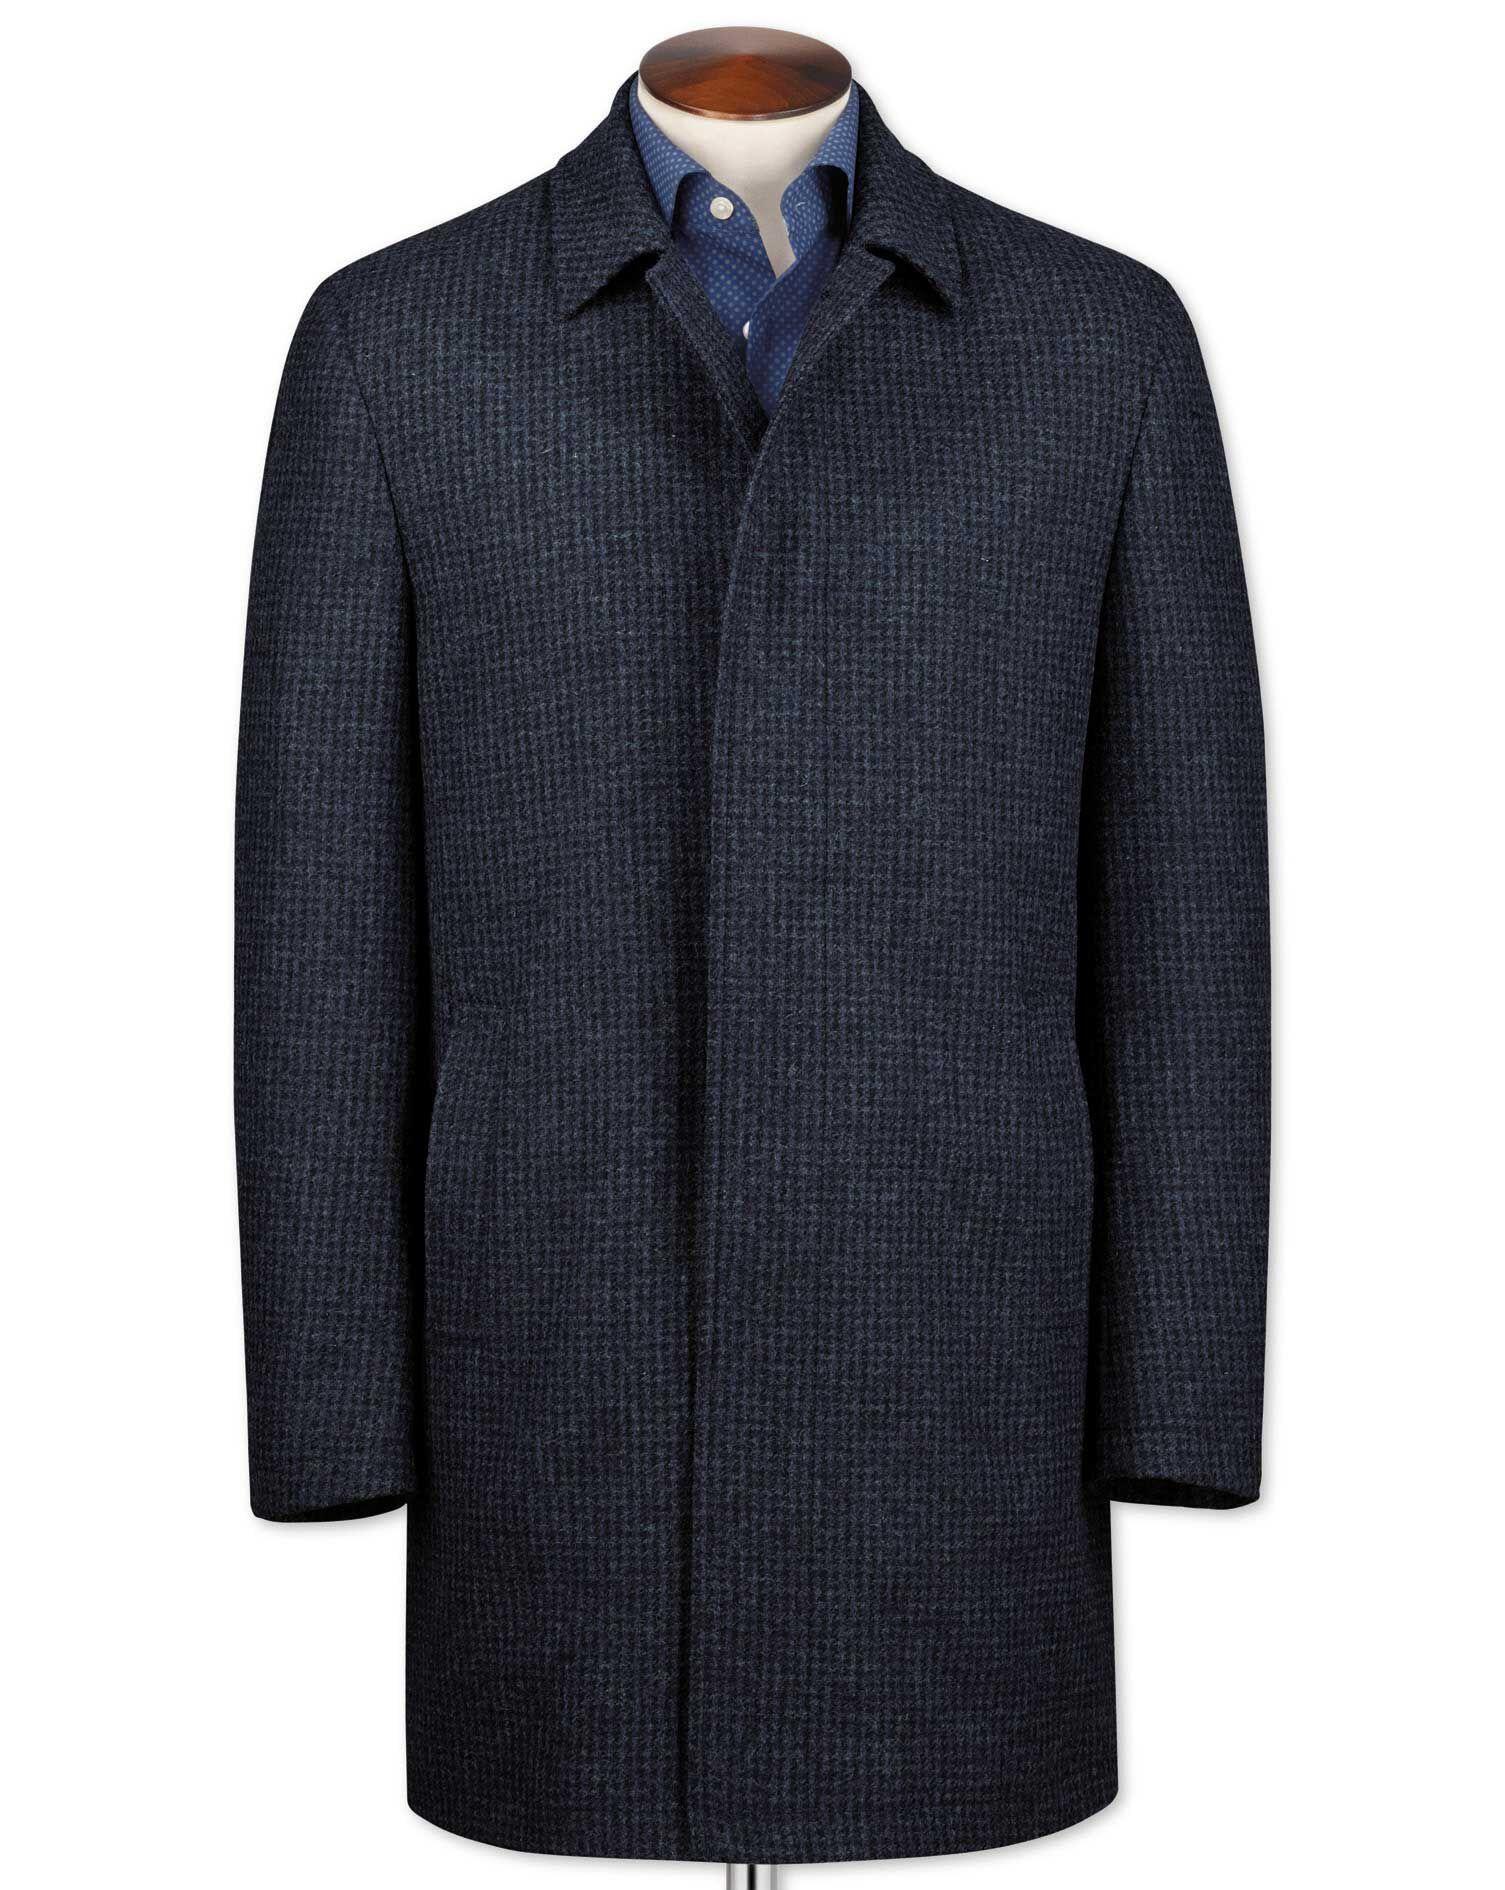 Blue Puppytooth Wool Car Wool Coat Size 48 Regular by Charles Tyrwhitt